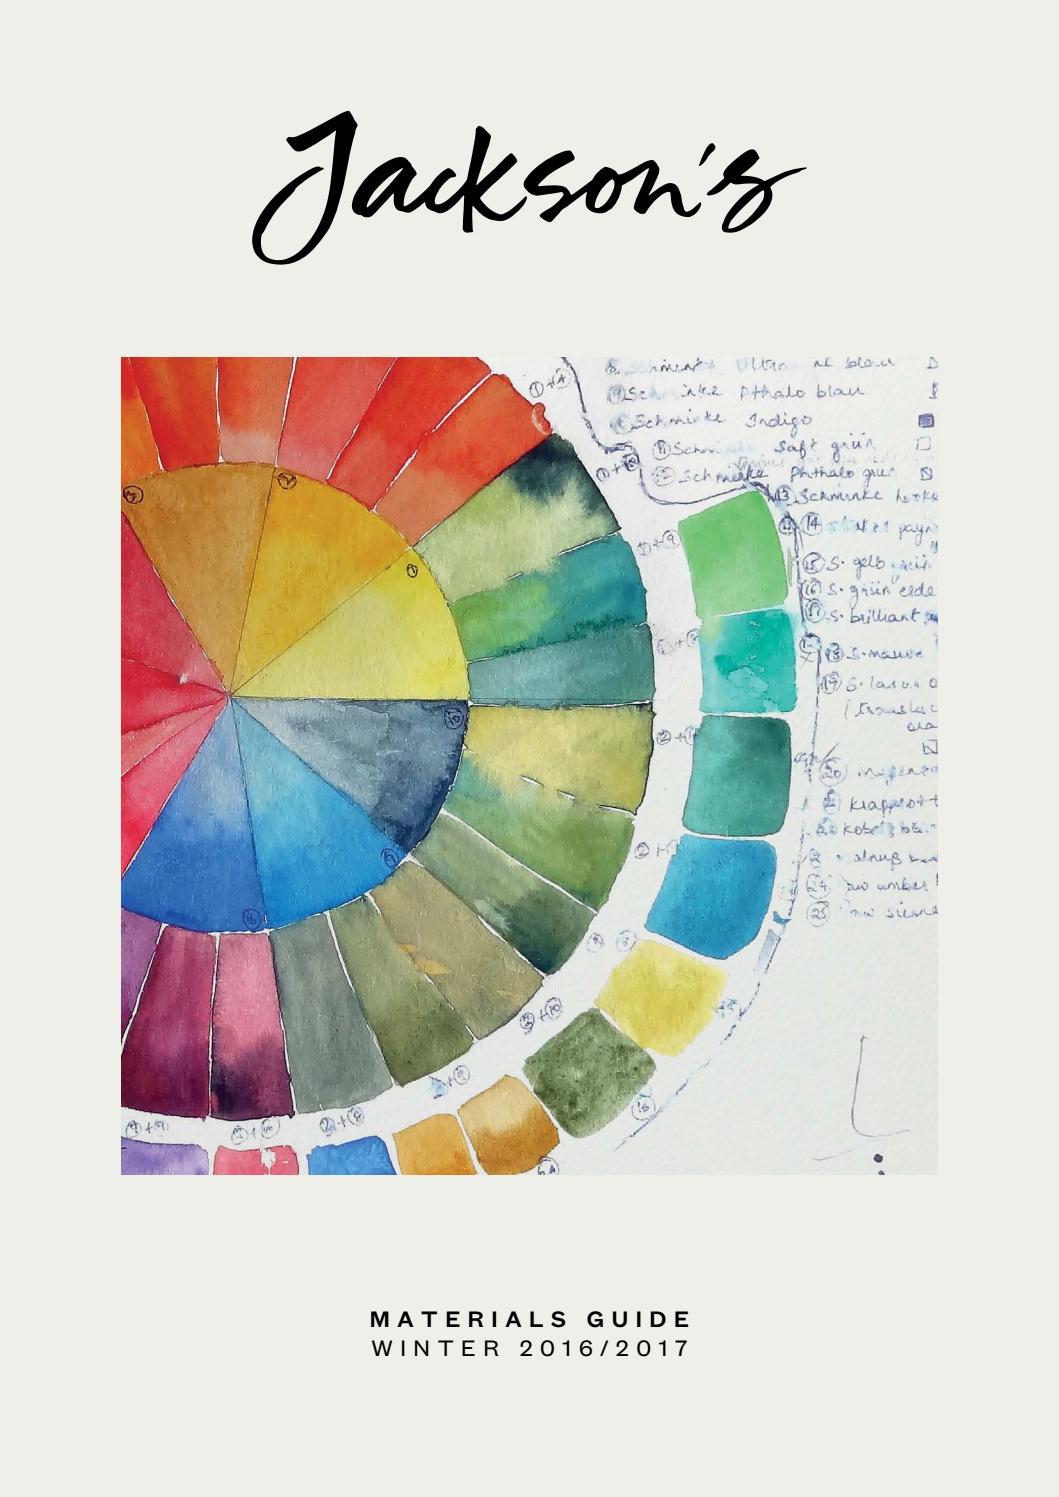 7207cd0b1ac Jackson s - Materials Guide - Winter 2016 by Jackson s Art Supplies ...